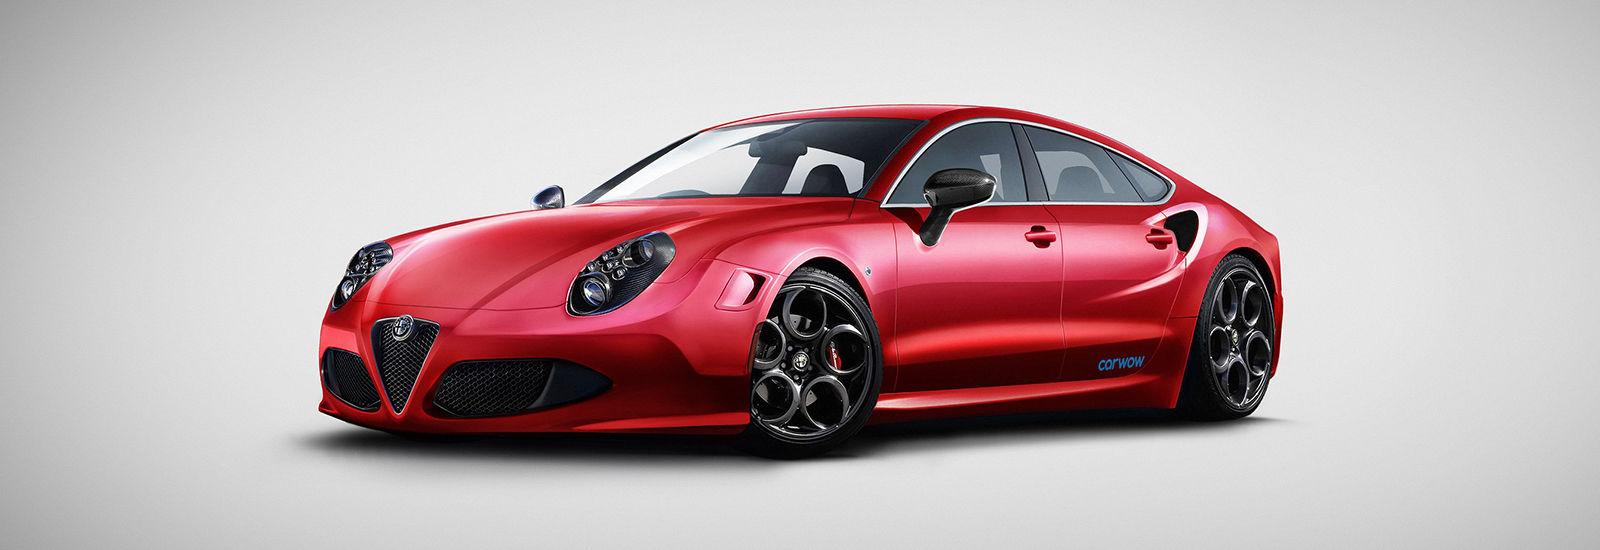 Audi_Romeo_RS74C